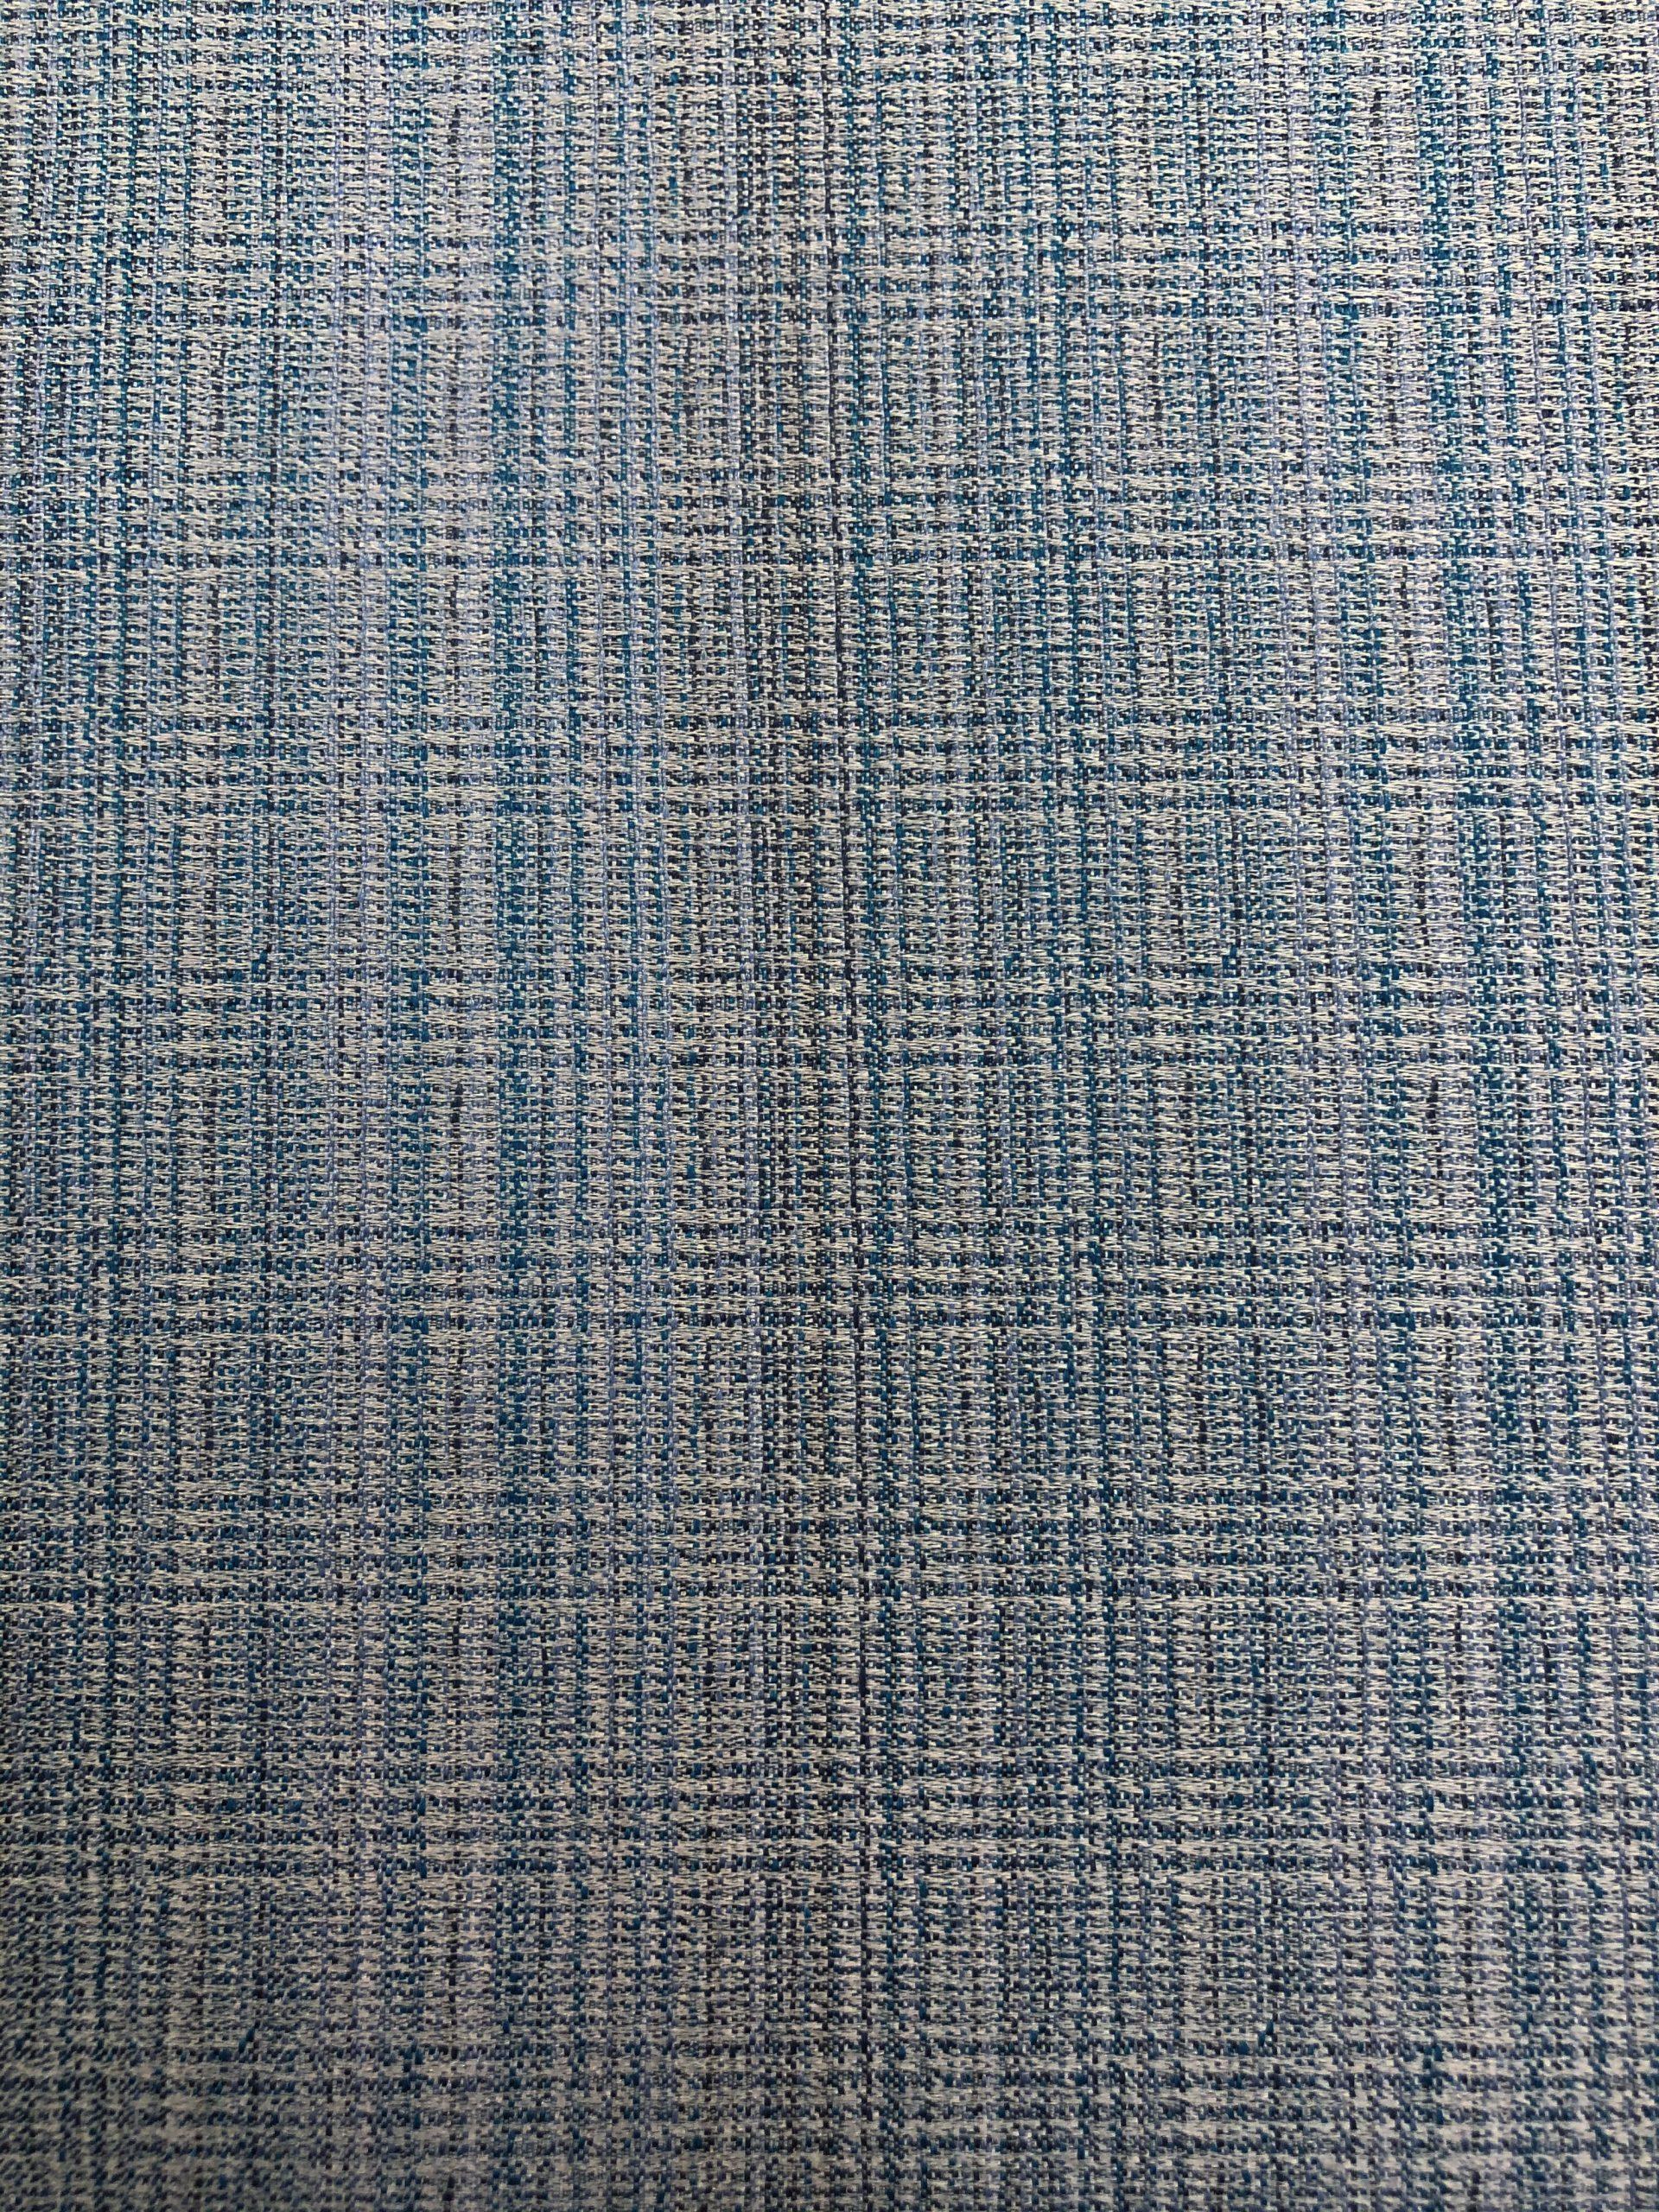 JACQUARD SILK ON BLUE, BLUE, WHITE AND BLACK SHADES